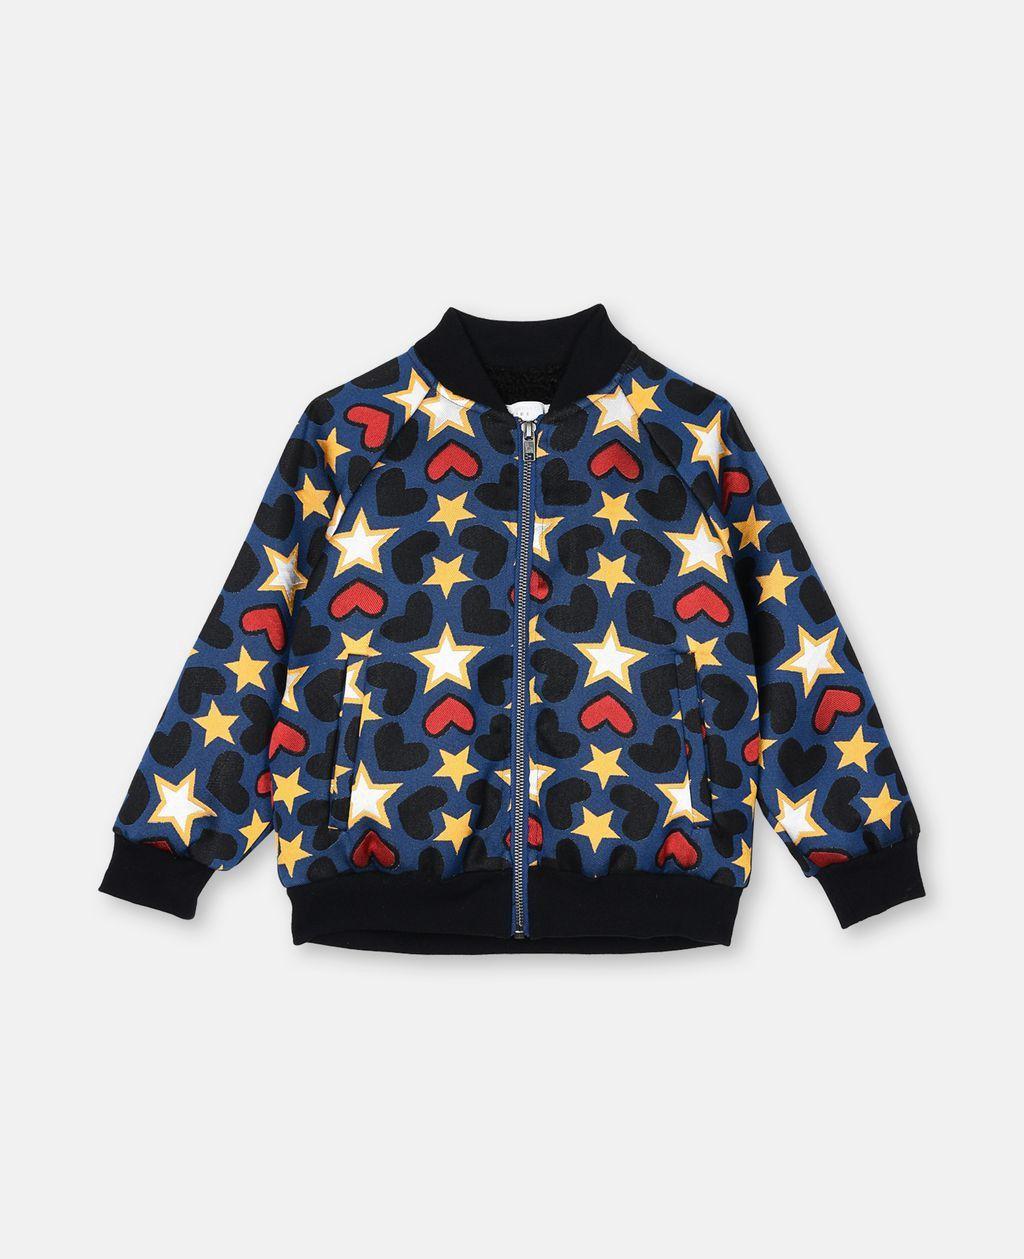 00303e79797f Stella Mccartney Tapestry Bomber Jacket - 13-14